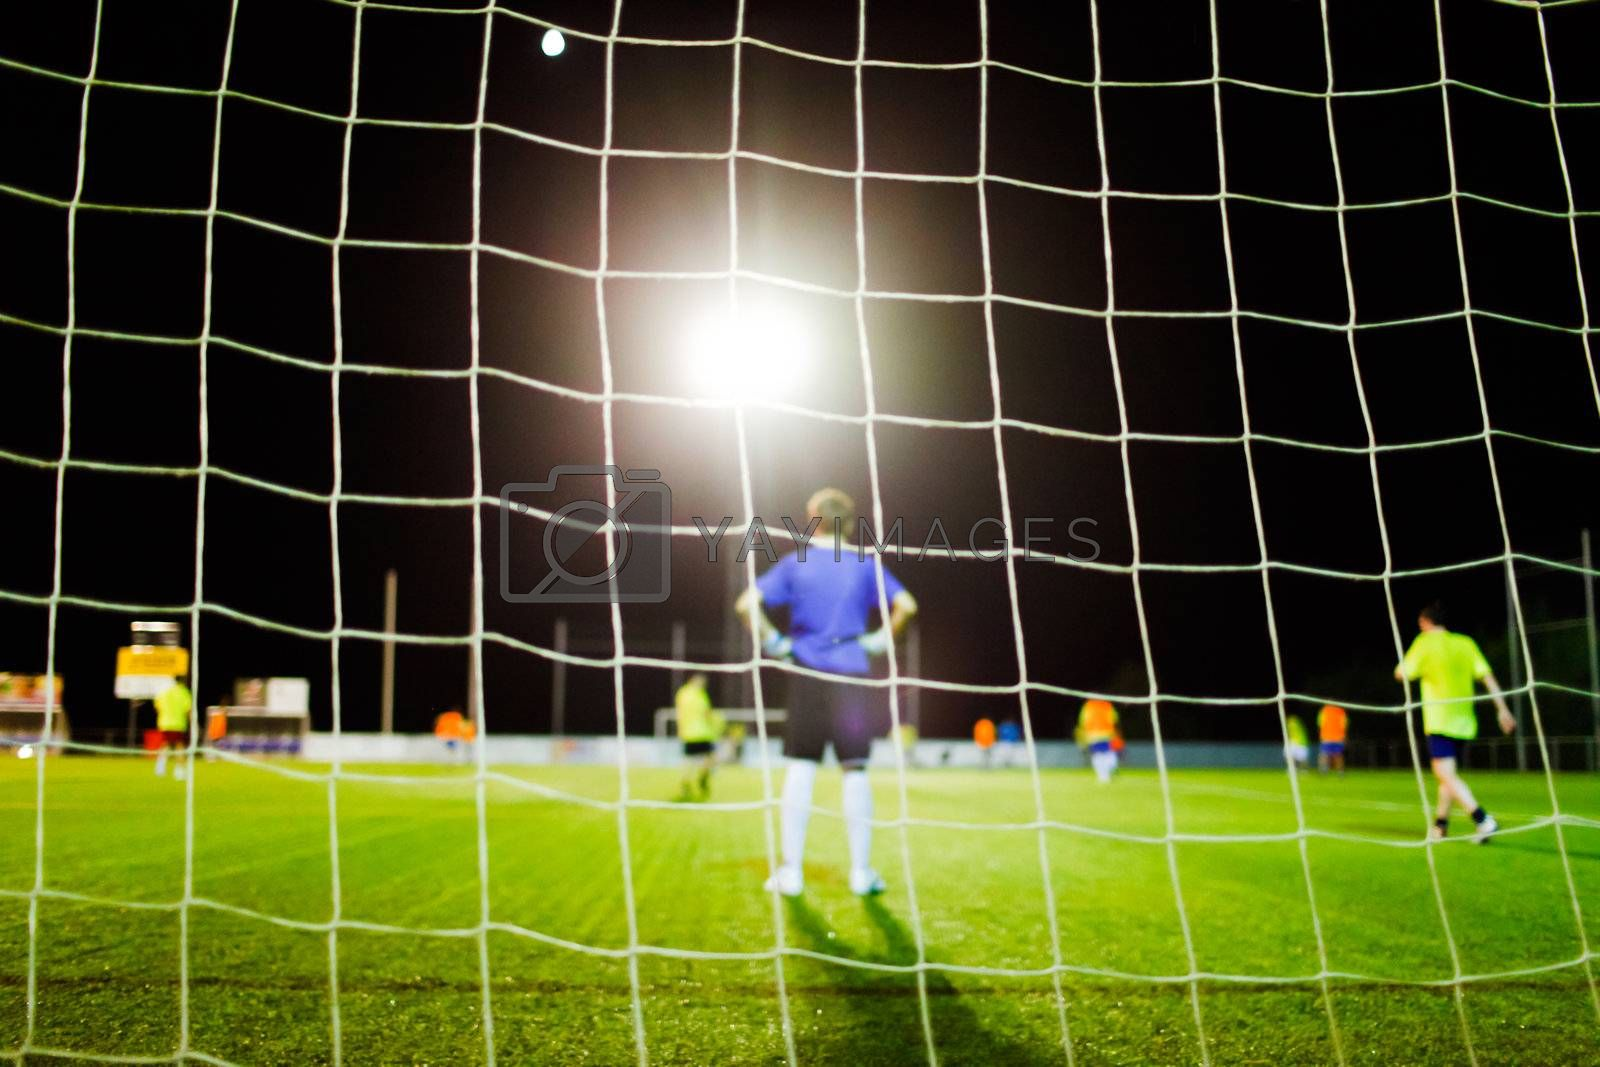 football match during training on stadium unfocused background